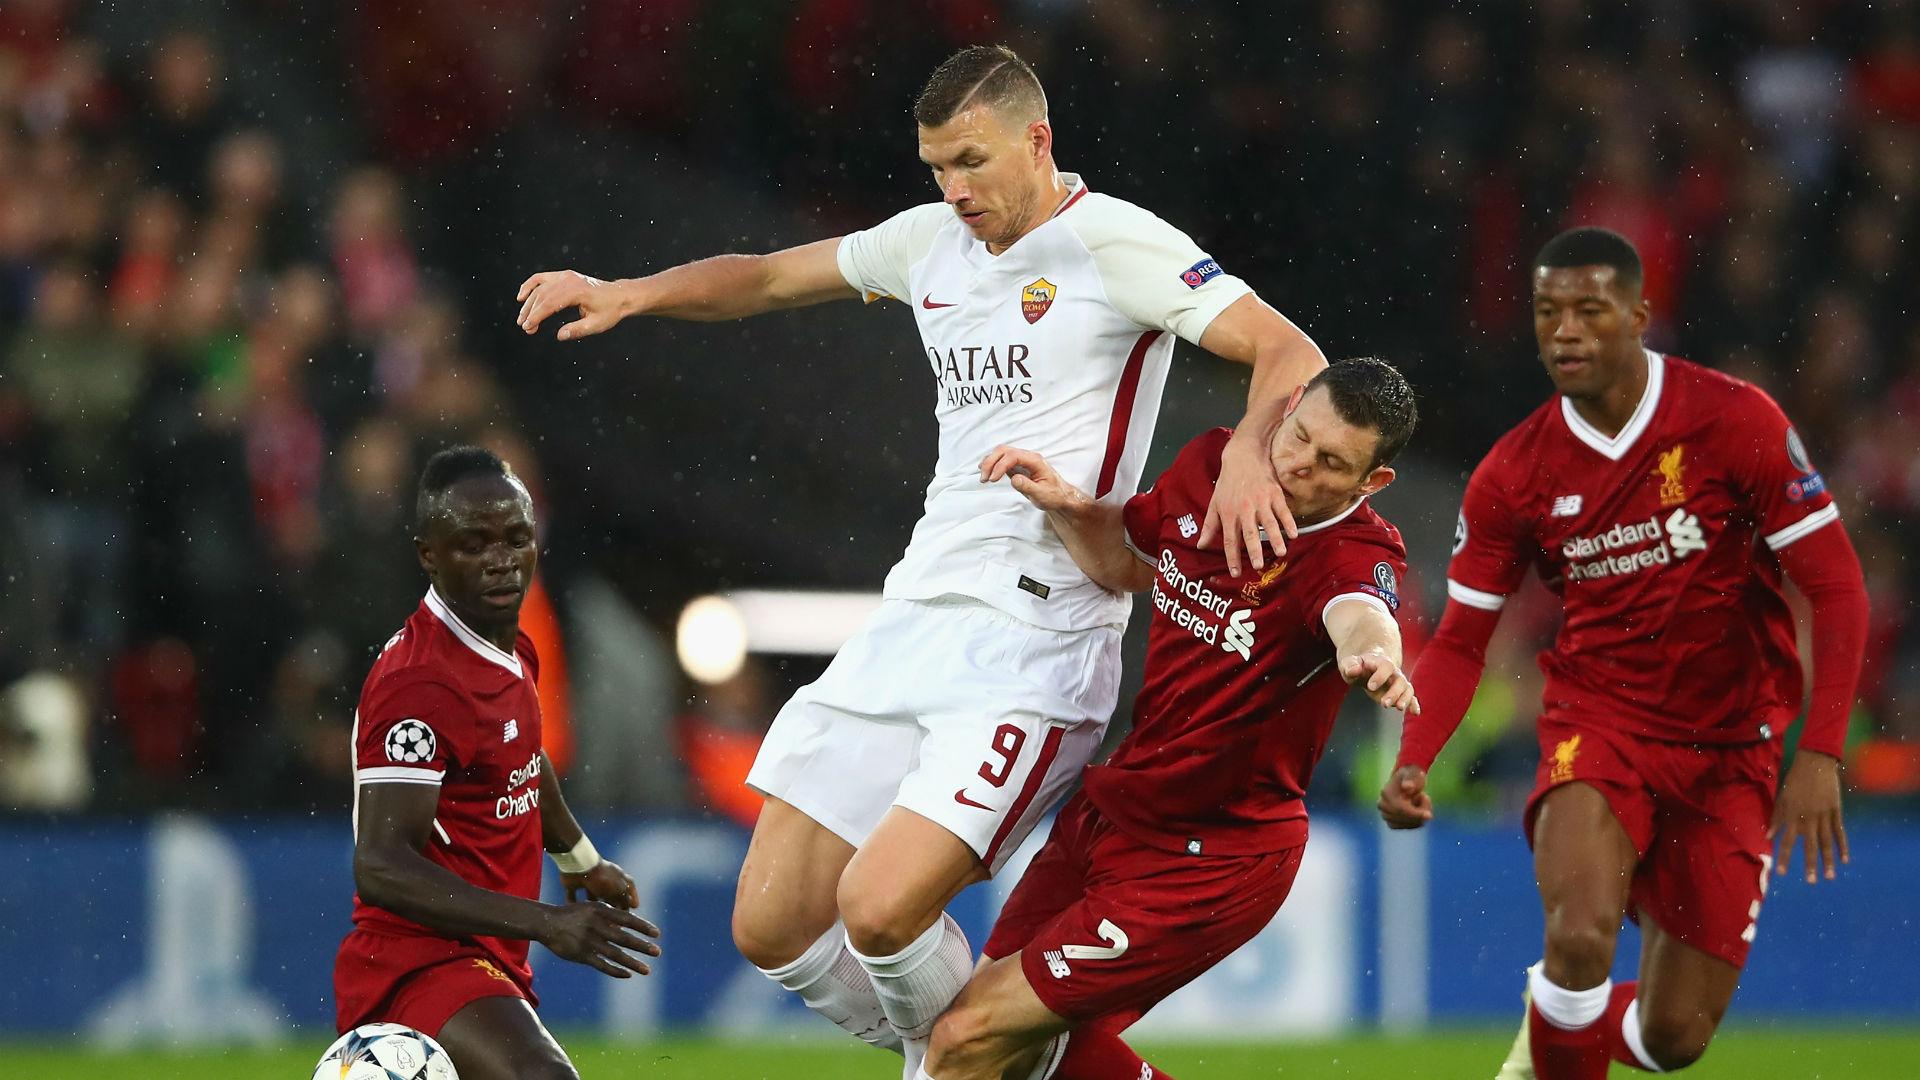 Edin Dzeko Sadio Mane James Milner Roma Liverpool Champions League